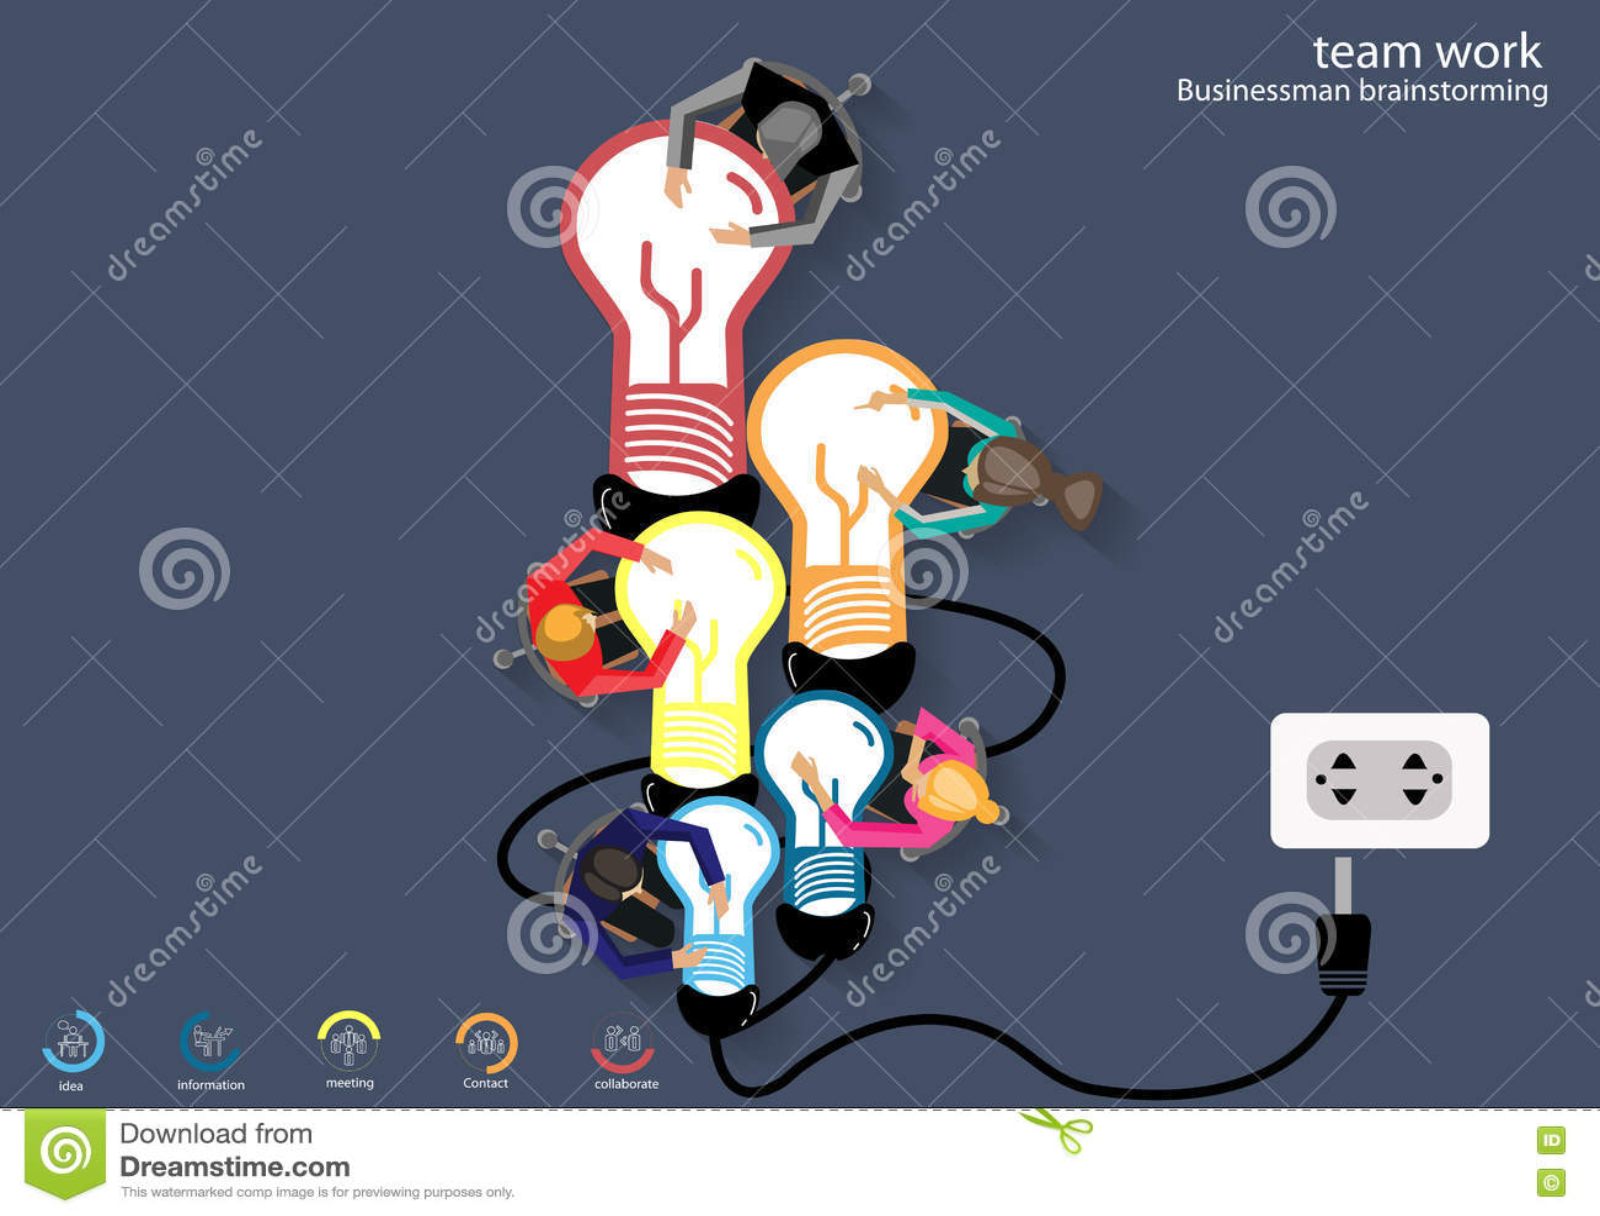 Vector Business Teamwork Brainstorming Ideas For A Lamp